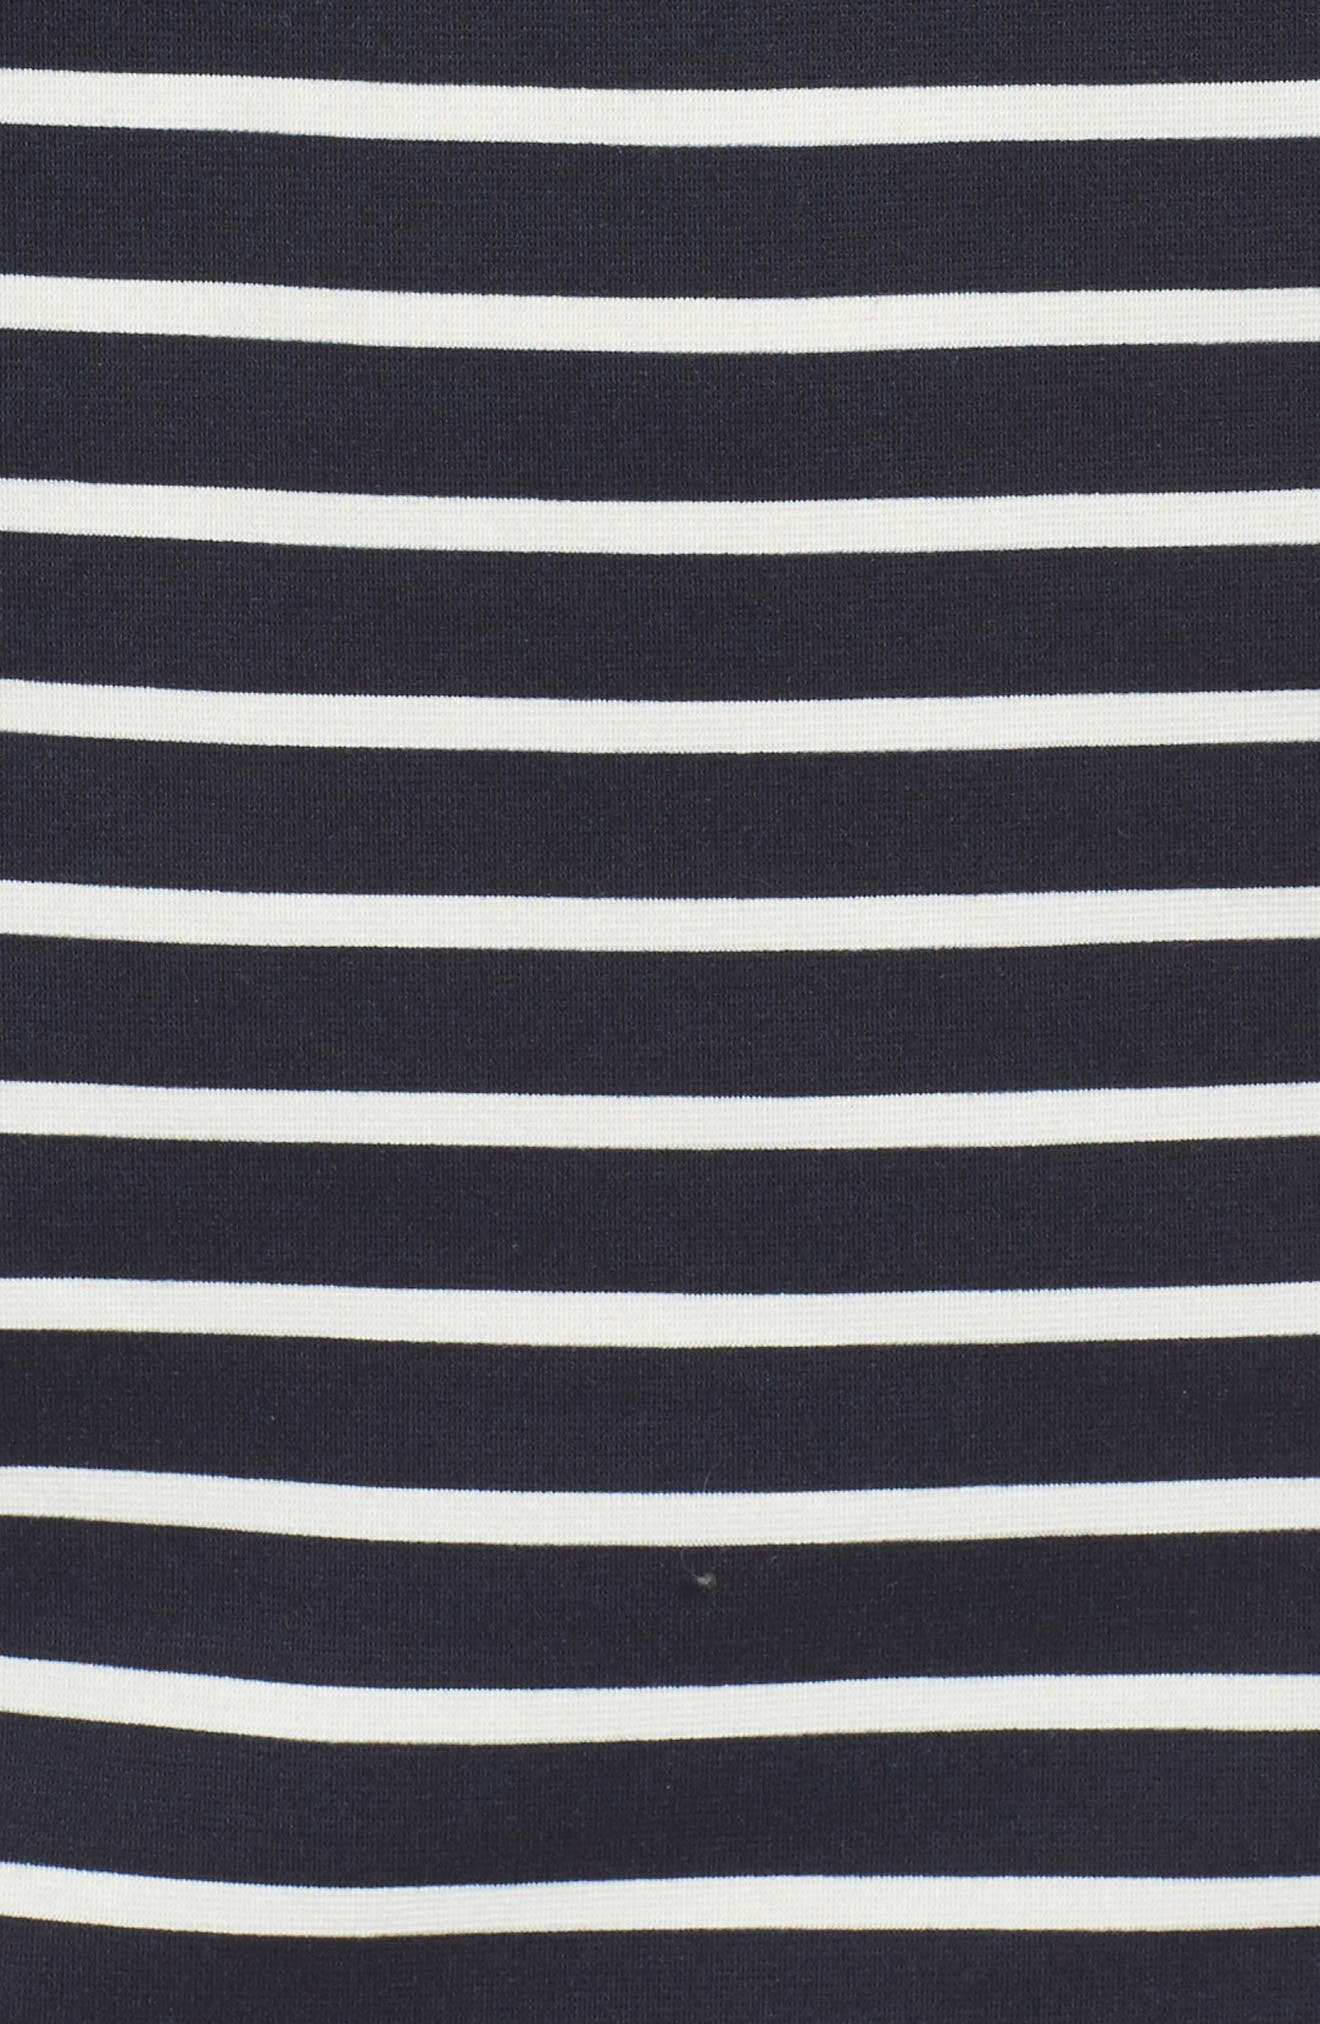 Puff Sleeve Shift Dress,                             Alternate thumbnail 5, color,                             Navy/ Ivory